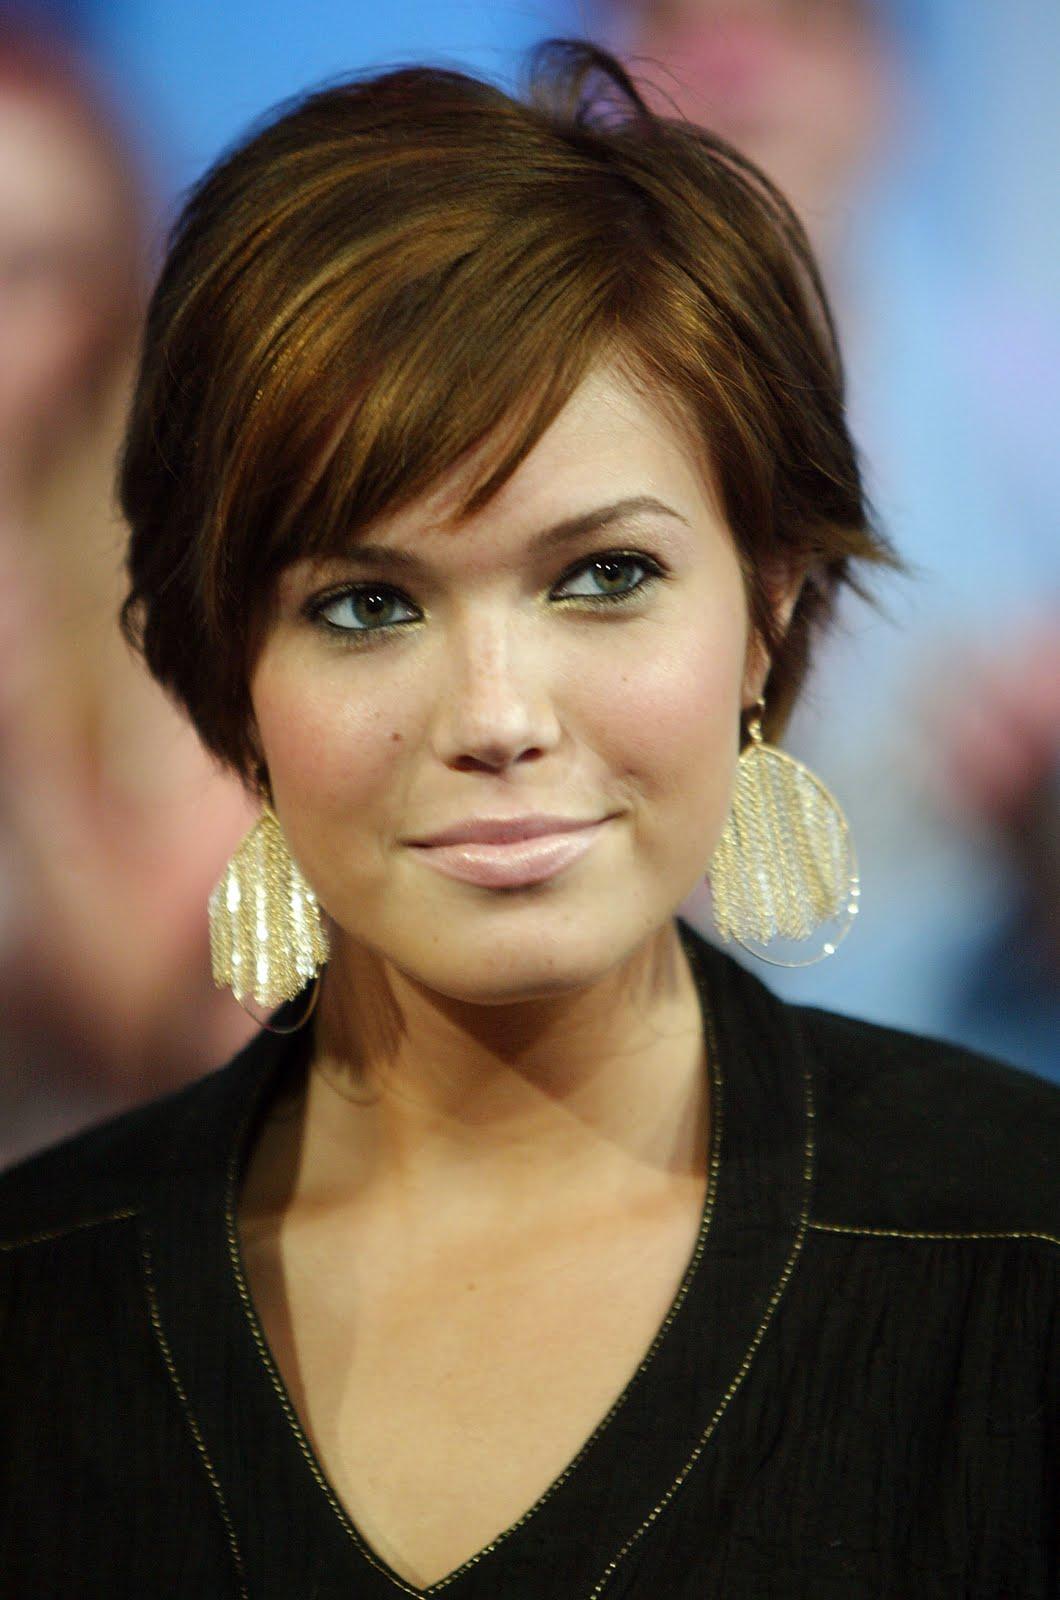 http://1.bp.blogspot.com/-0a1erEYAi4A/Ti2BvhB2o8I/AAAAAAAABXQ/lSJIZa9zwu4/s1600/Mandy-Moore-Hair-1.jpg